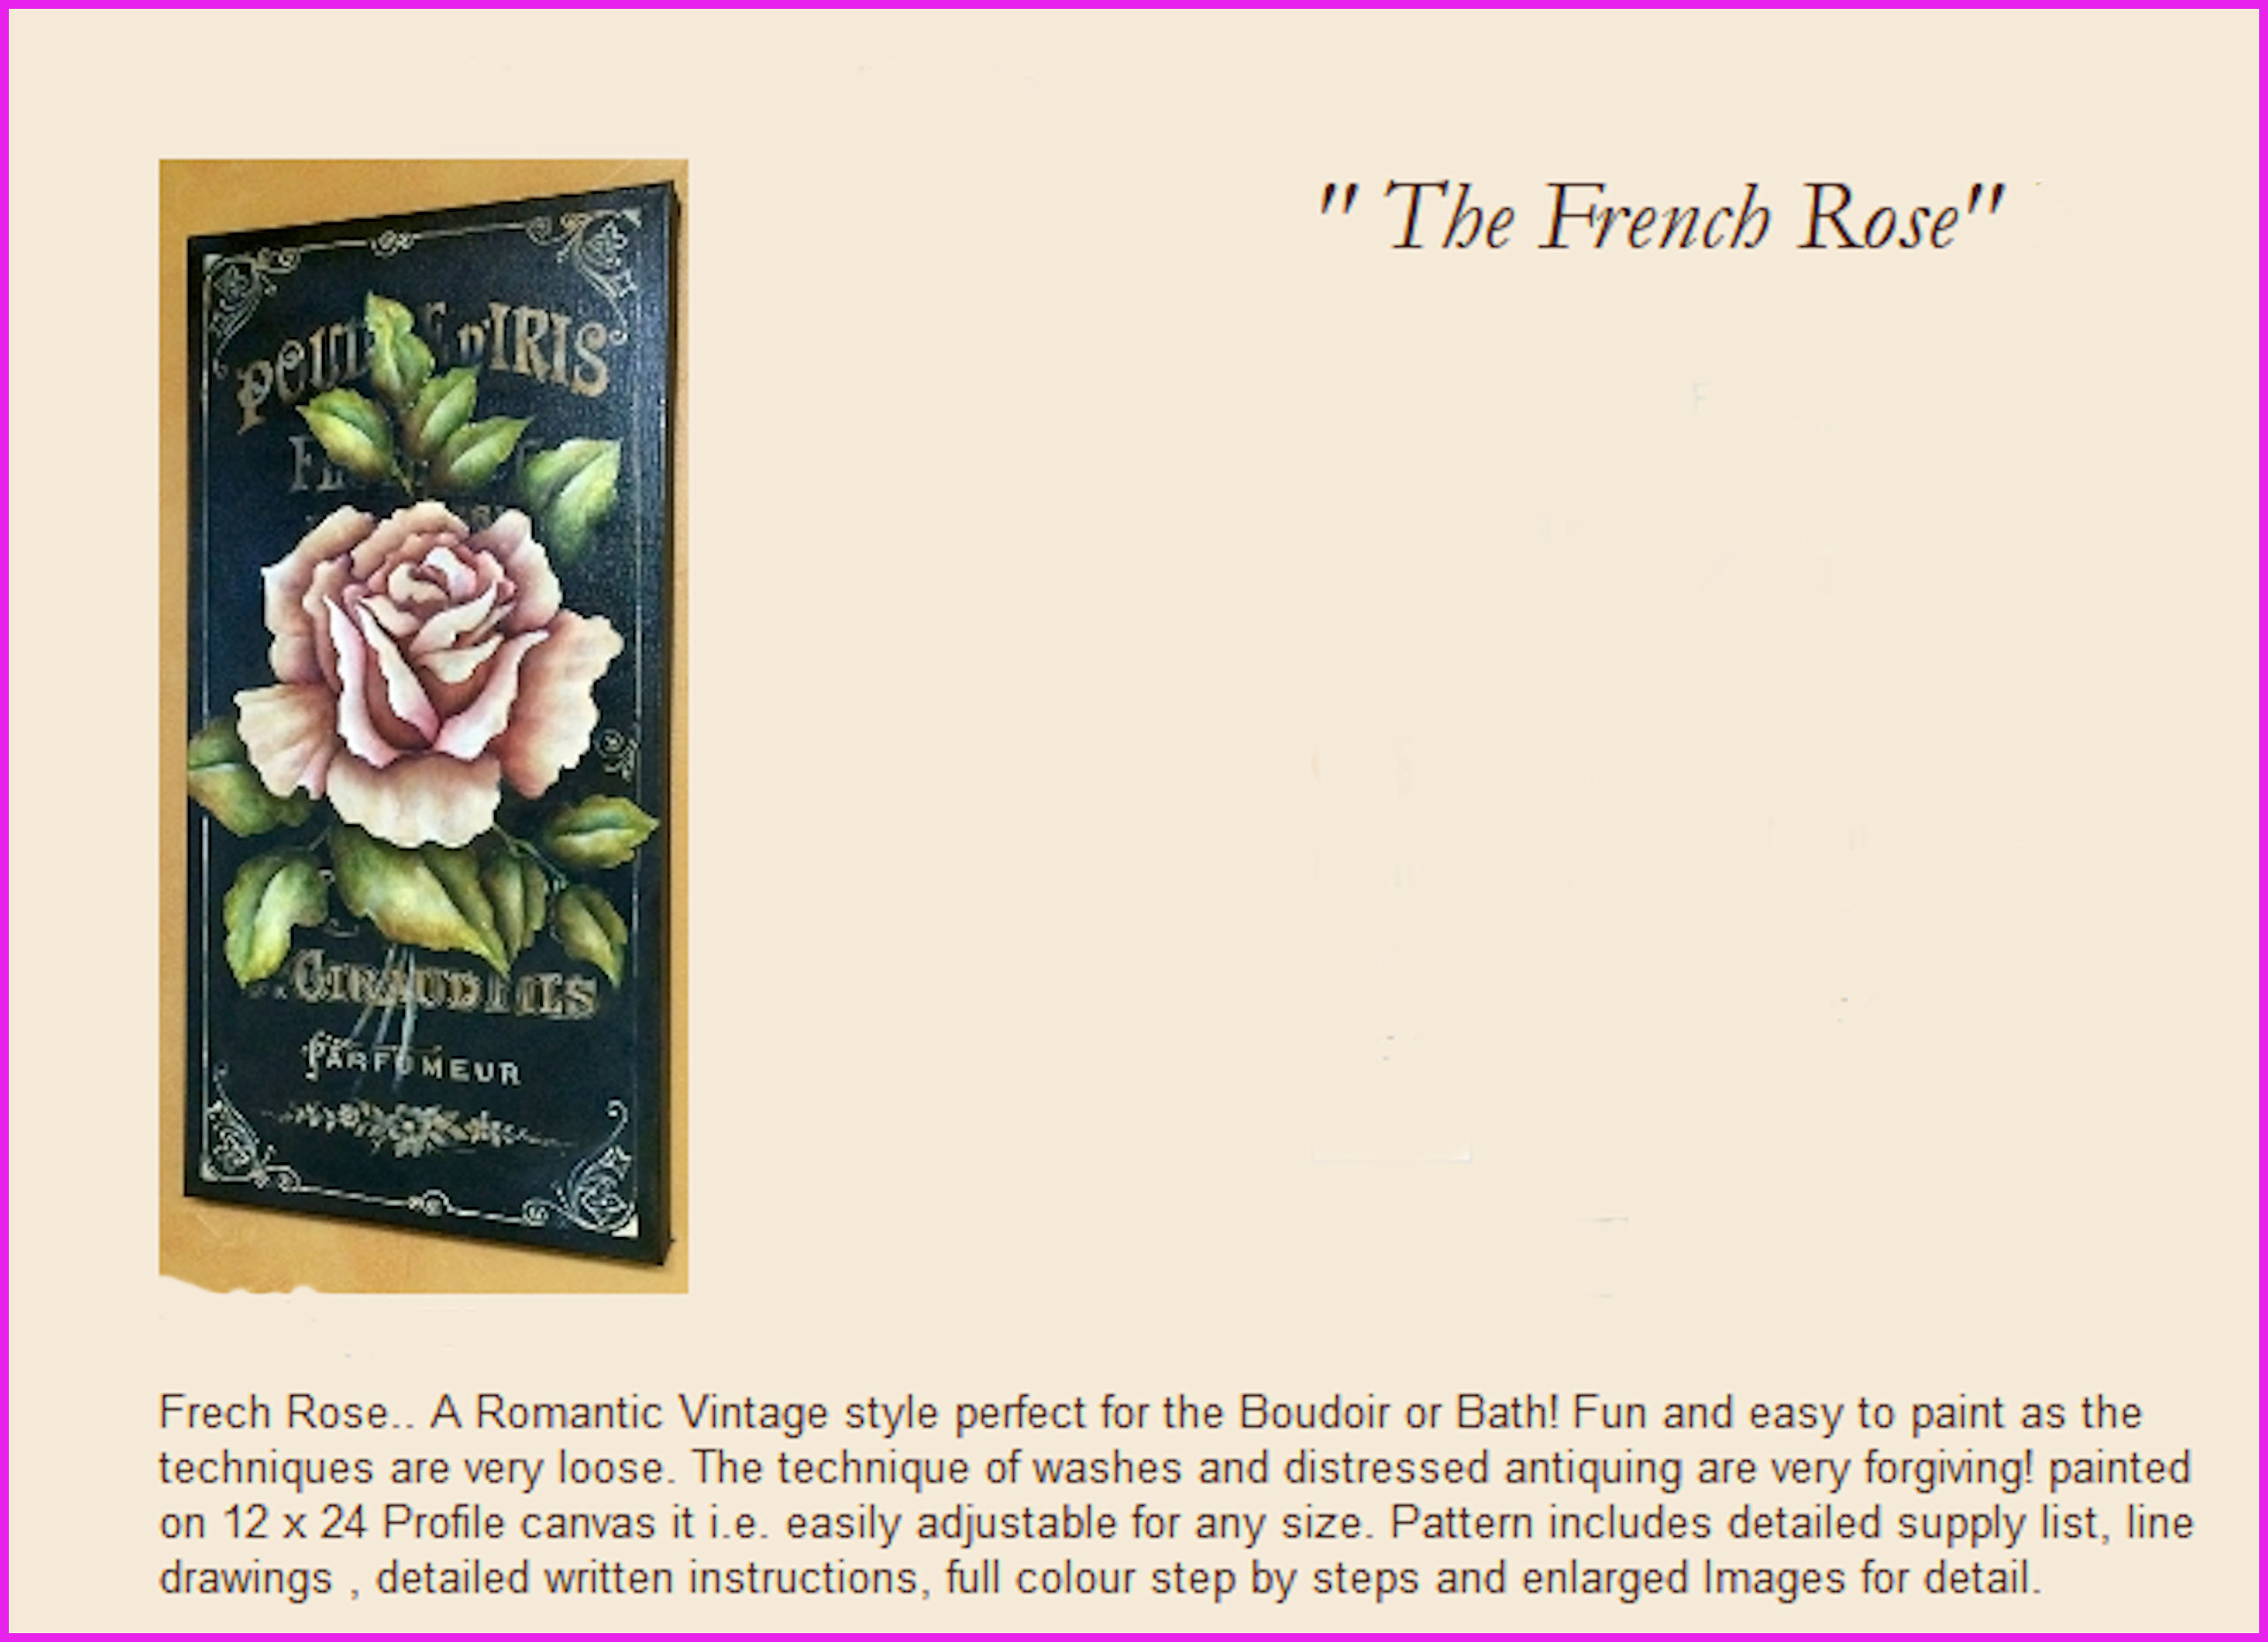 tm-french-rose-pattern-tm05306.jpg